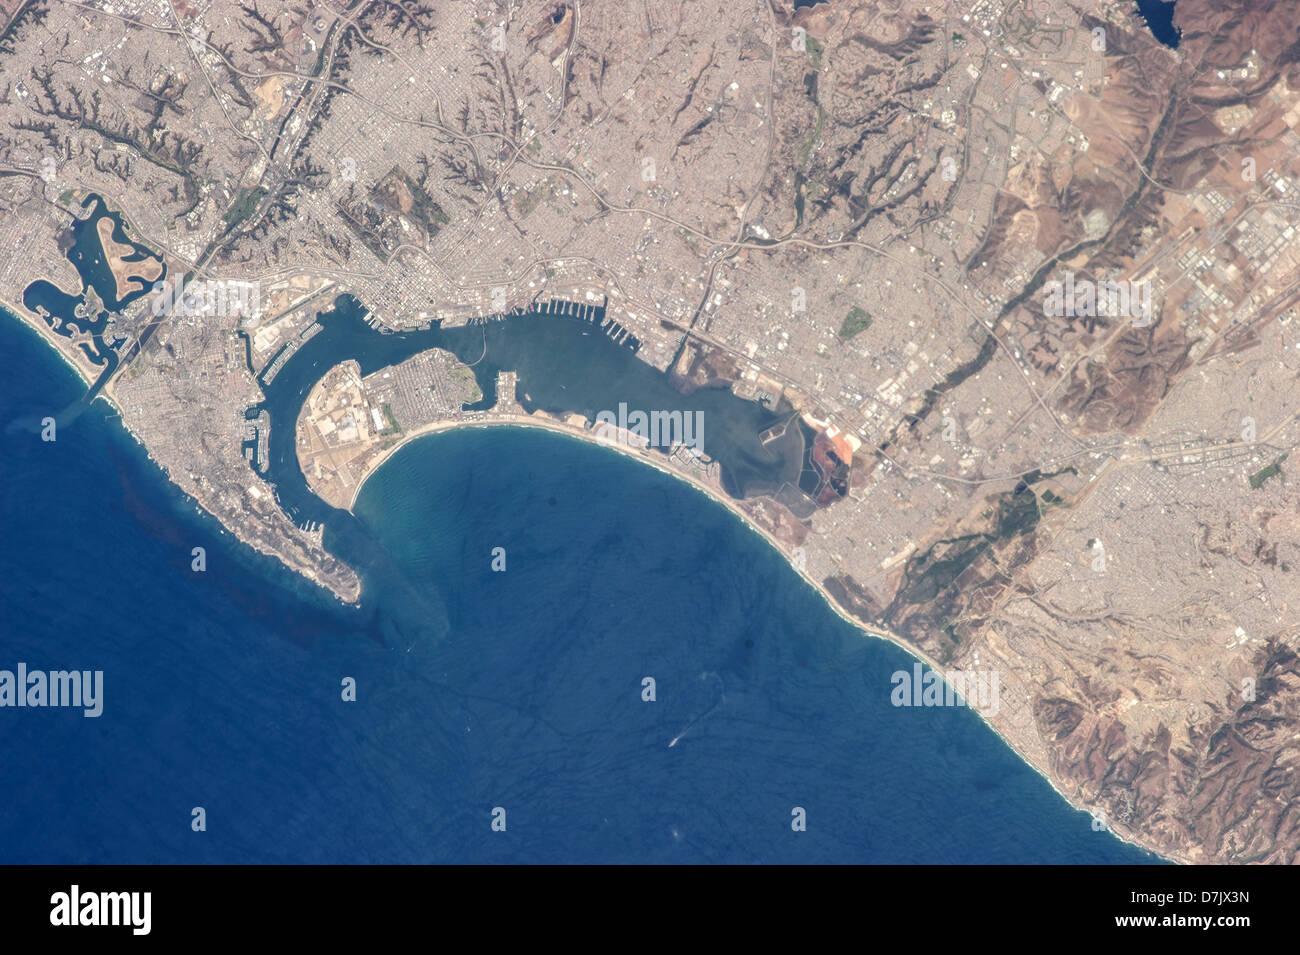 San Diego, California, and Tijuana, Baja California - Stock Image